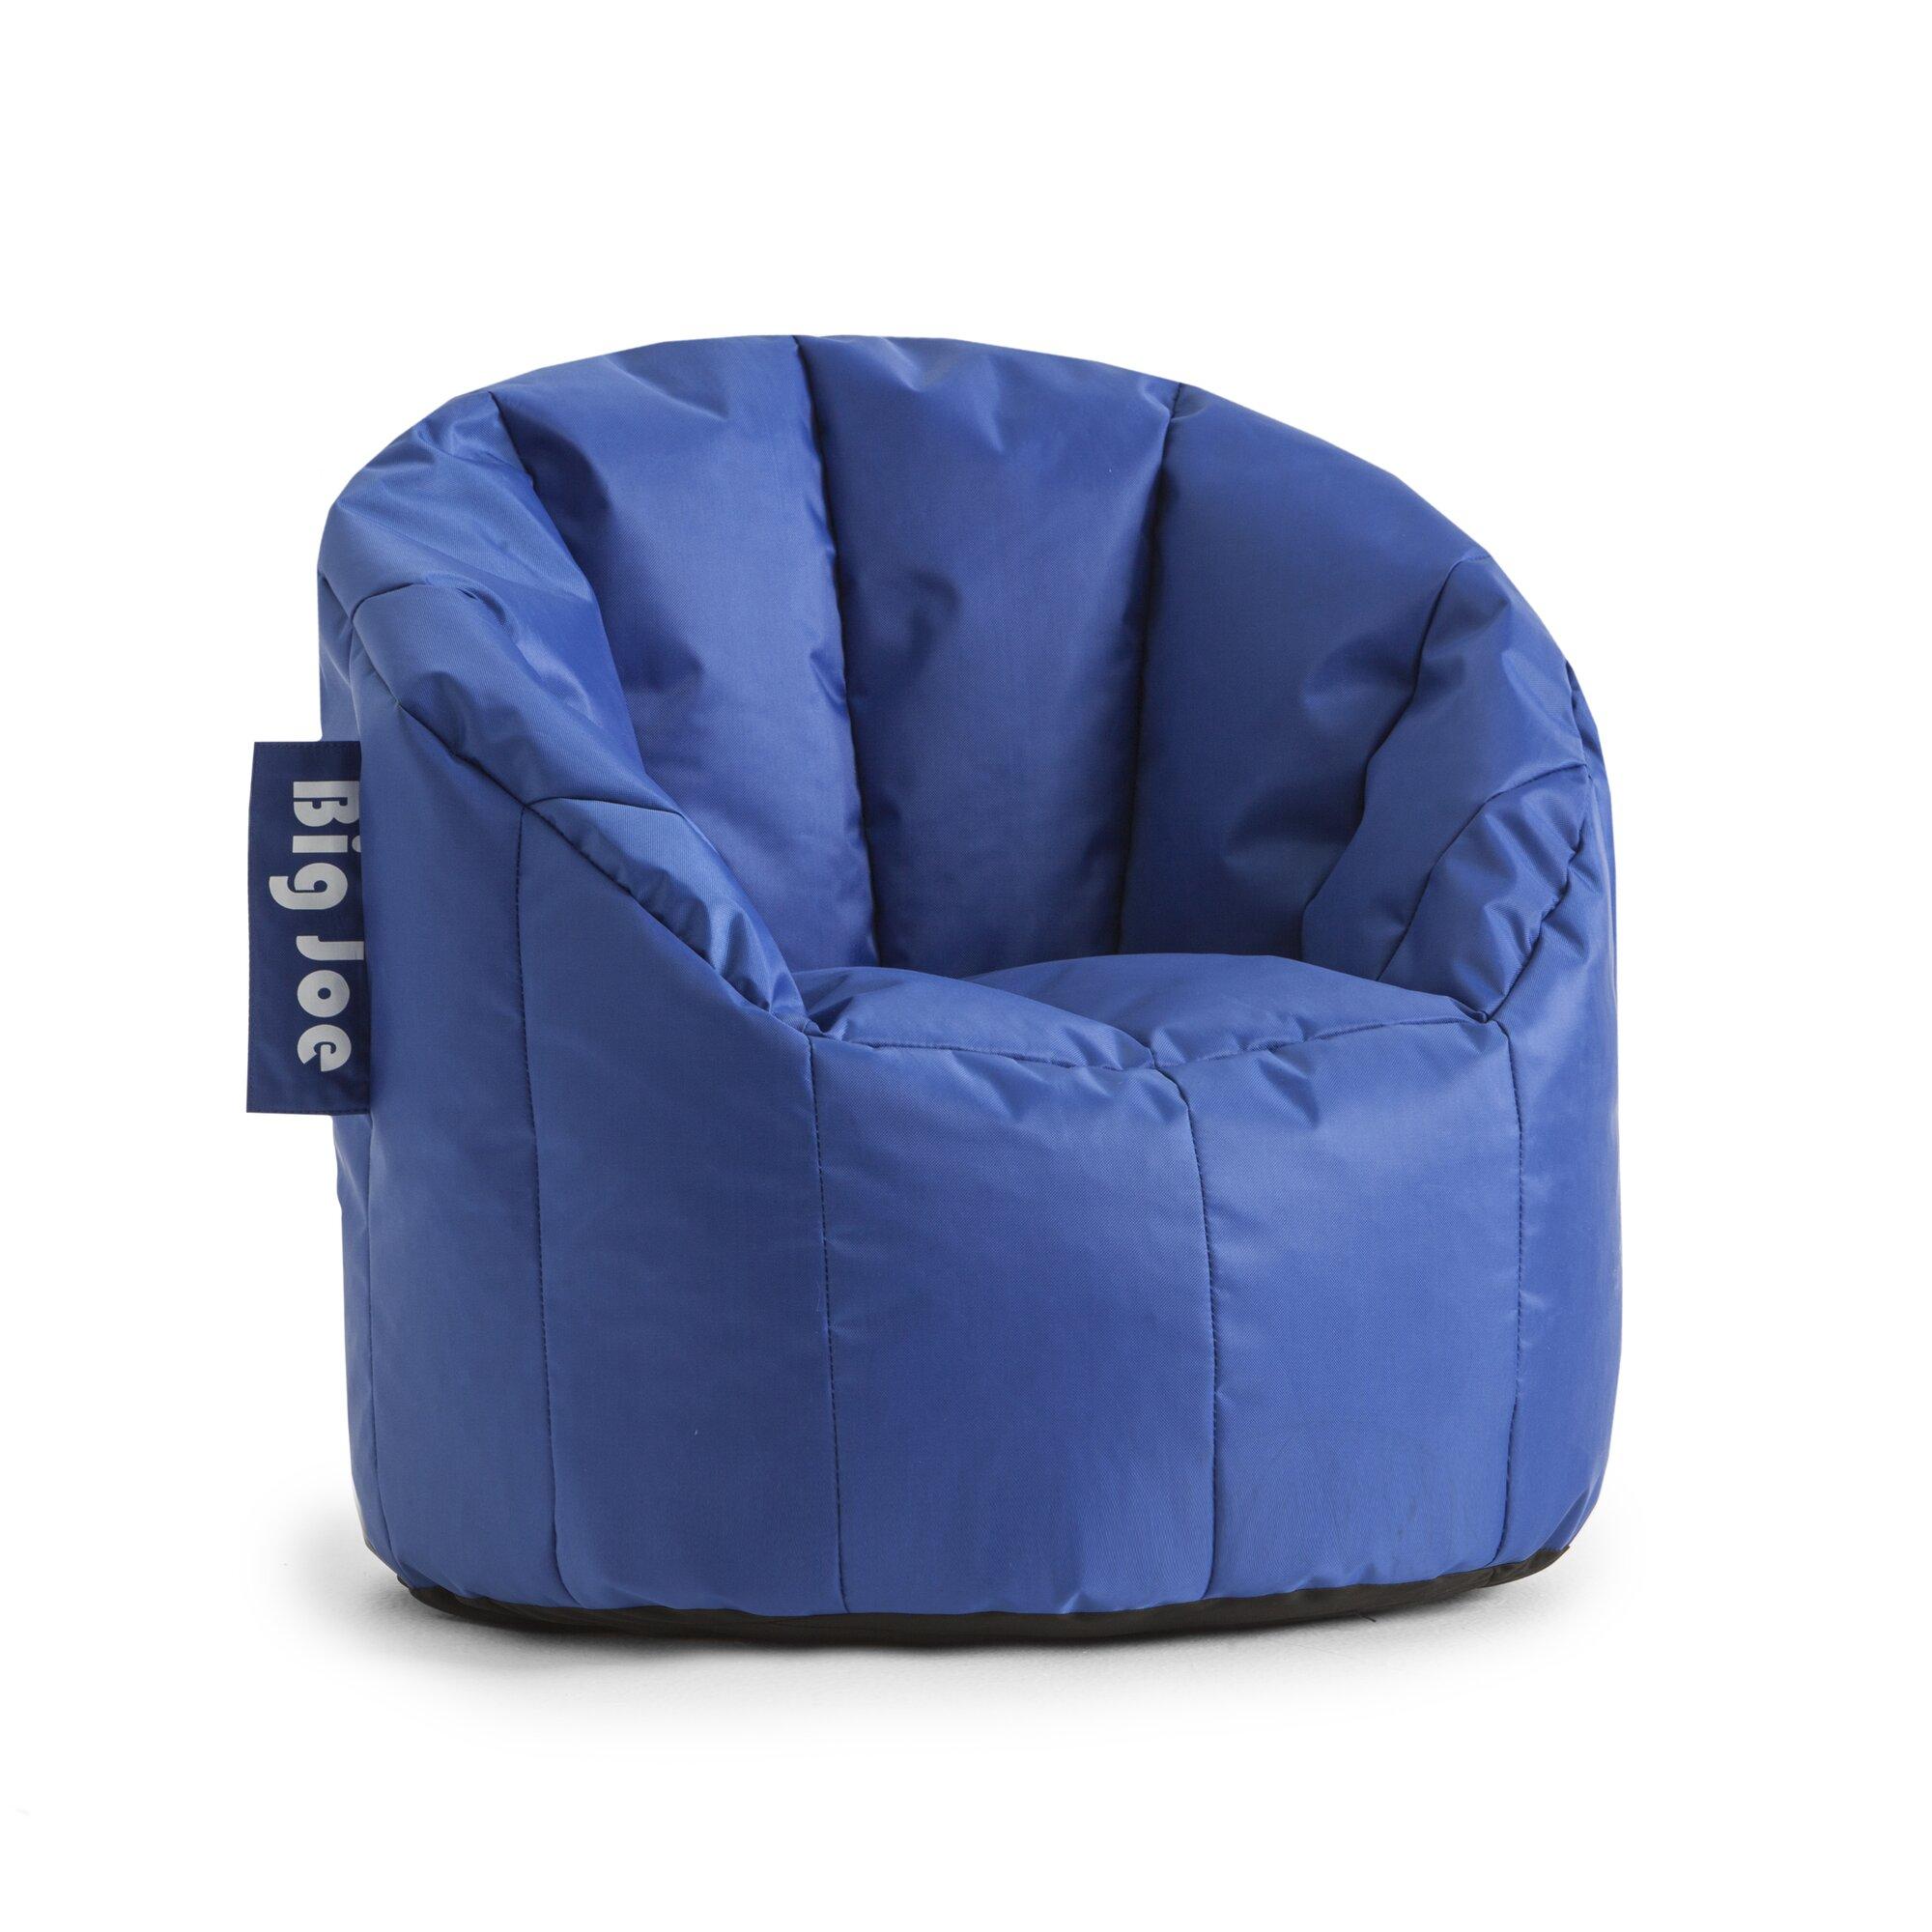 Big joe lumin chair blue - Big Joe Lumin Chair Black Big Joe Kids Bean Bag Lounger